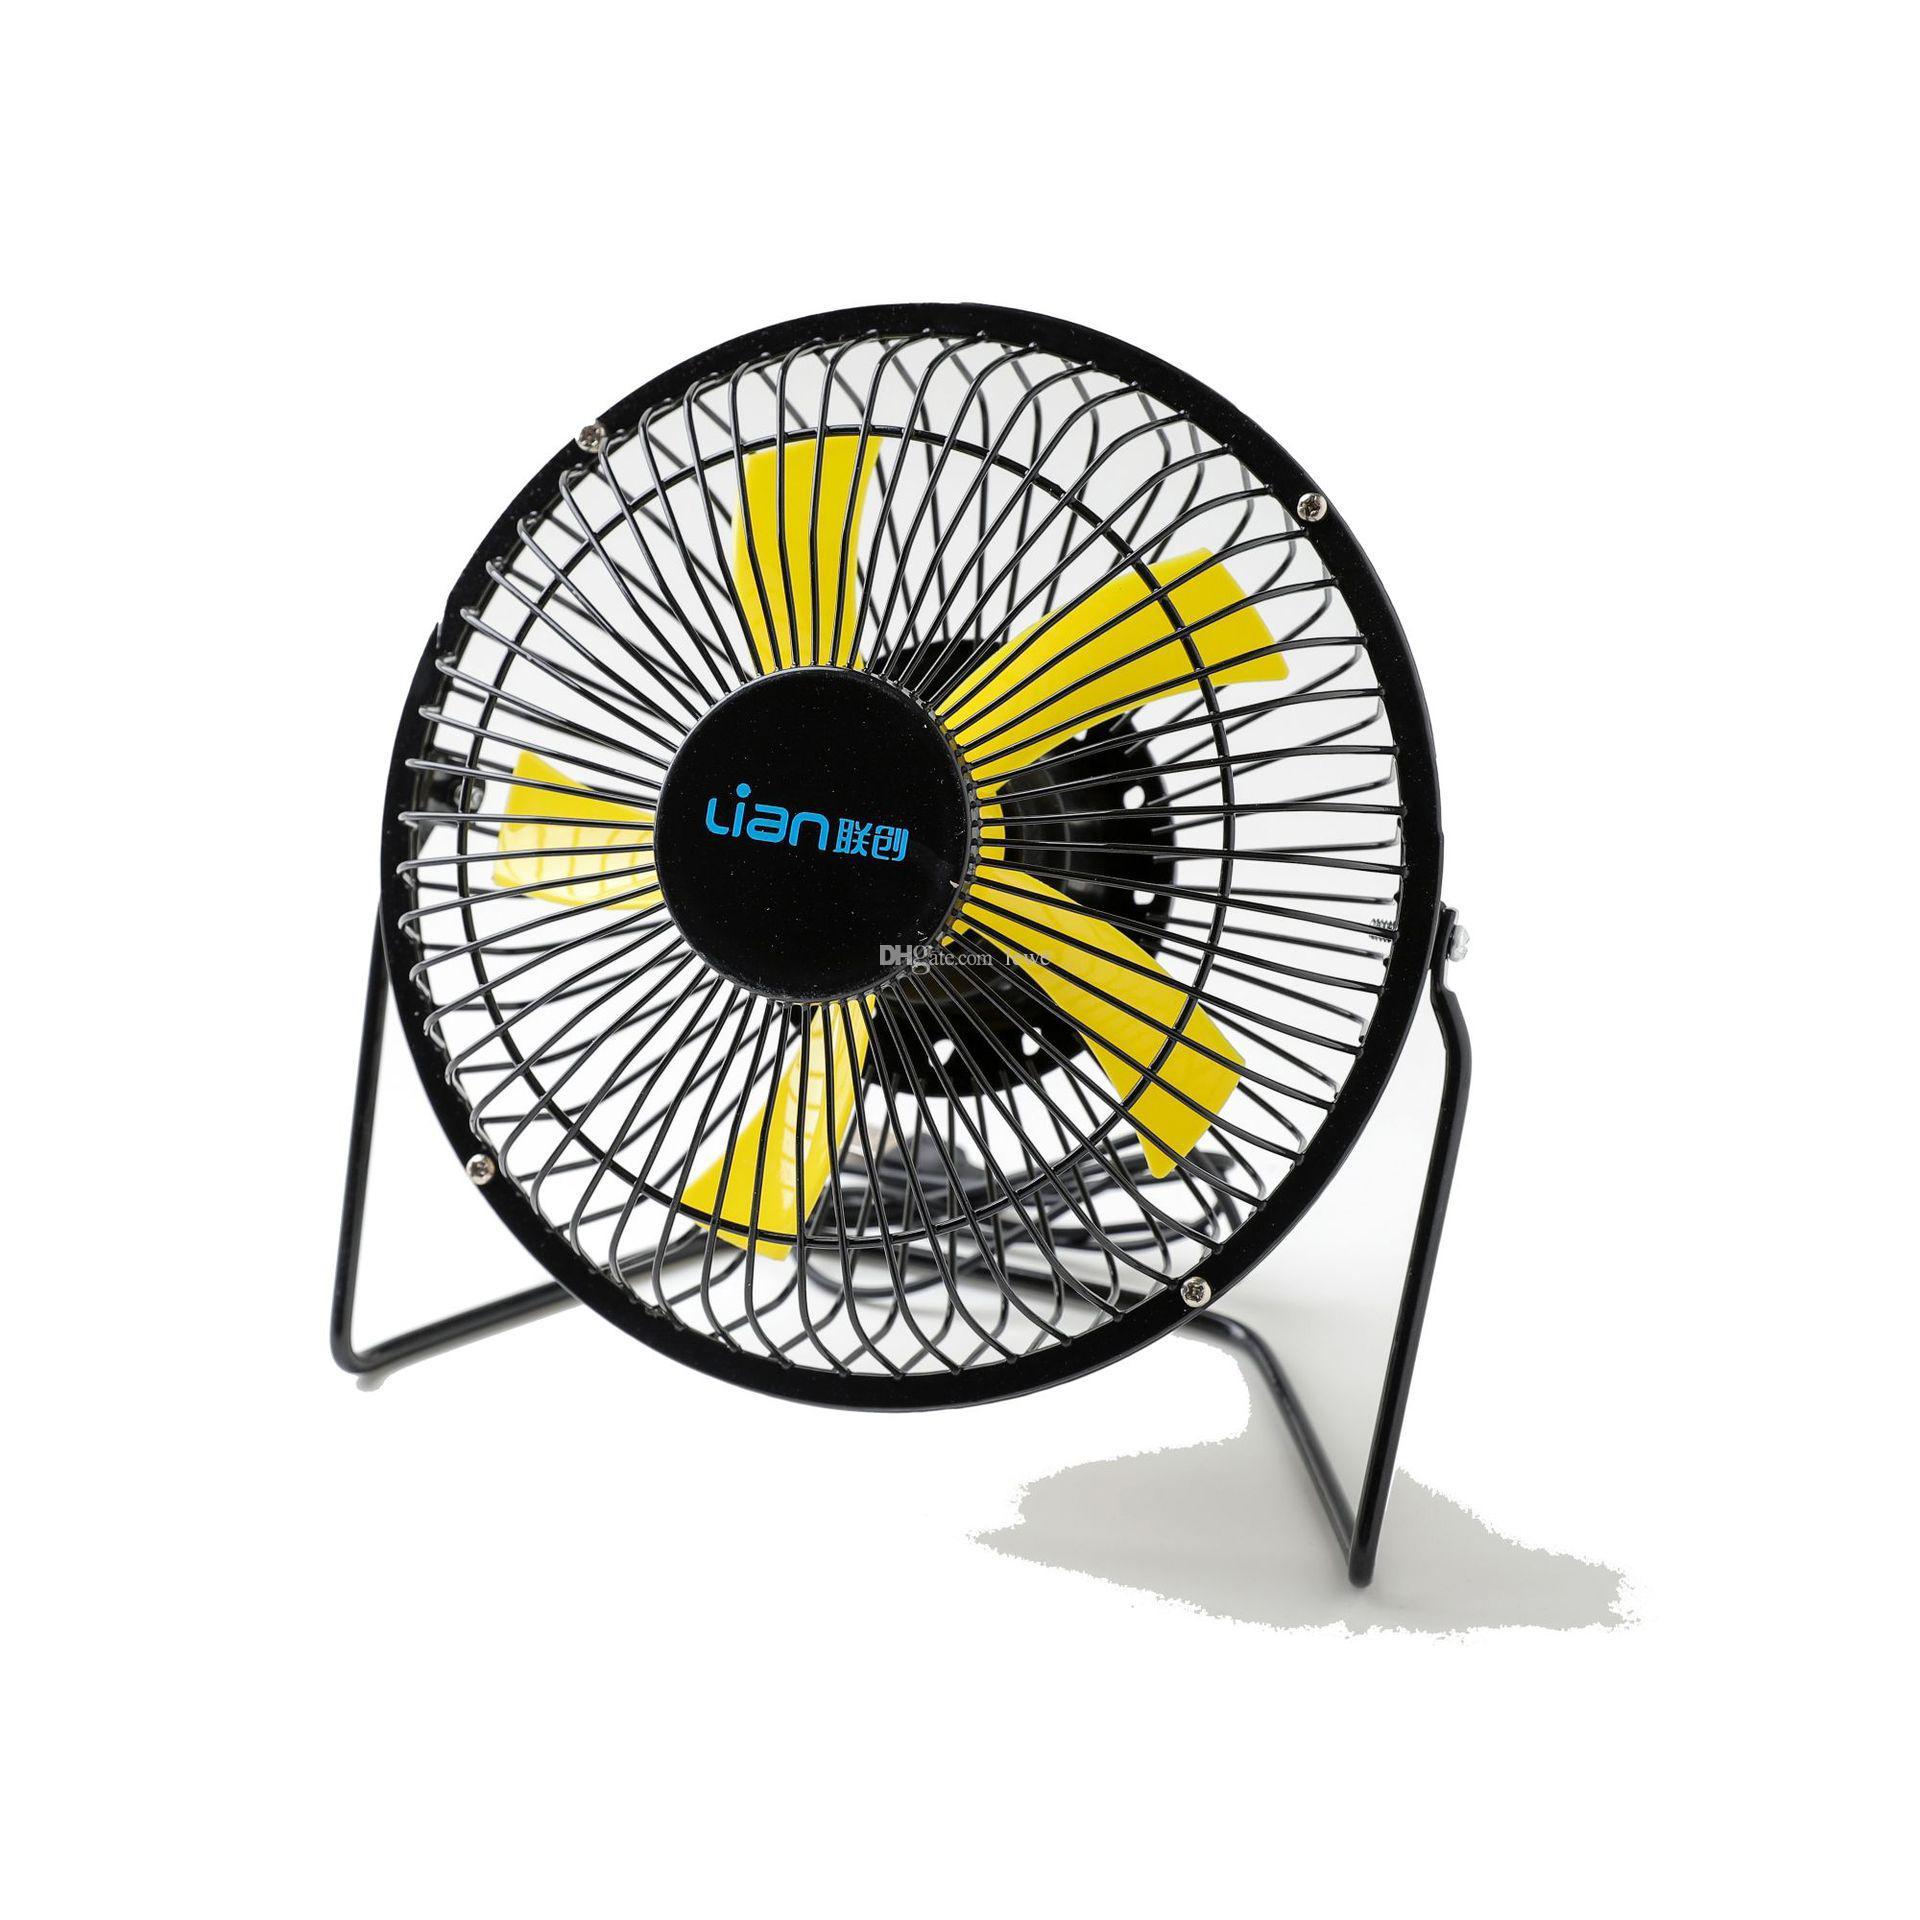 Portable Mini USB Fan 6 Inch Metal Powerful Cooling Fan Desk Fan Air Circulator Quiet Operation for Home Office